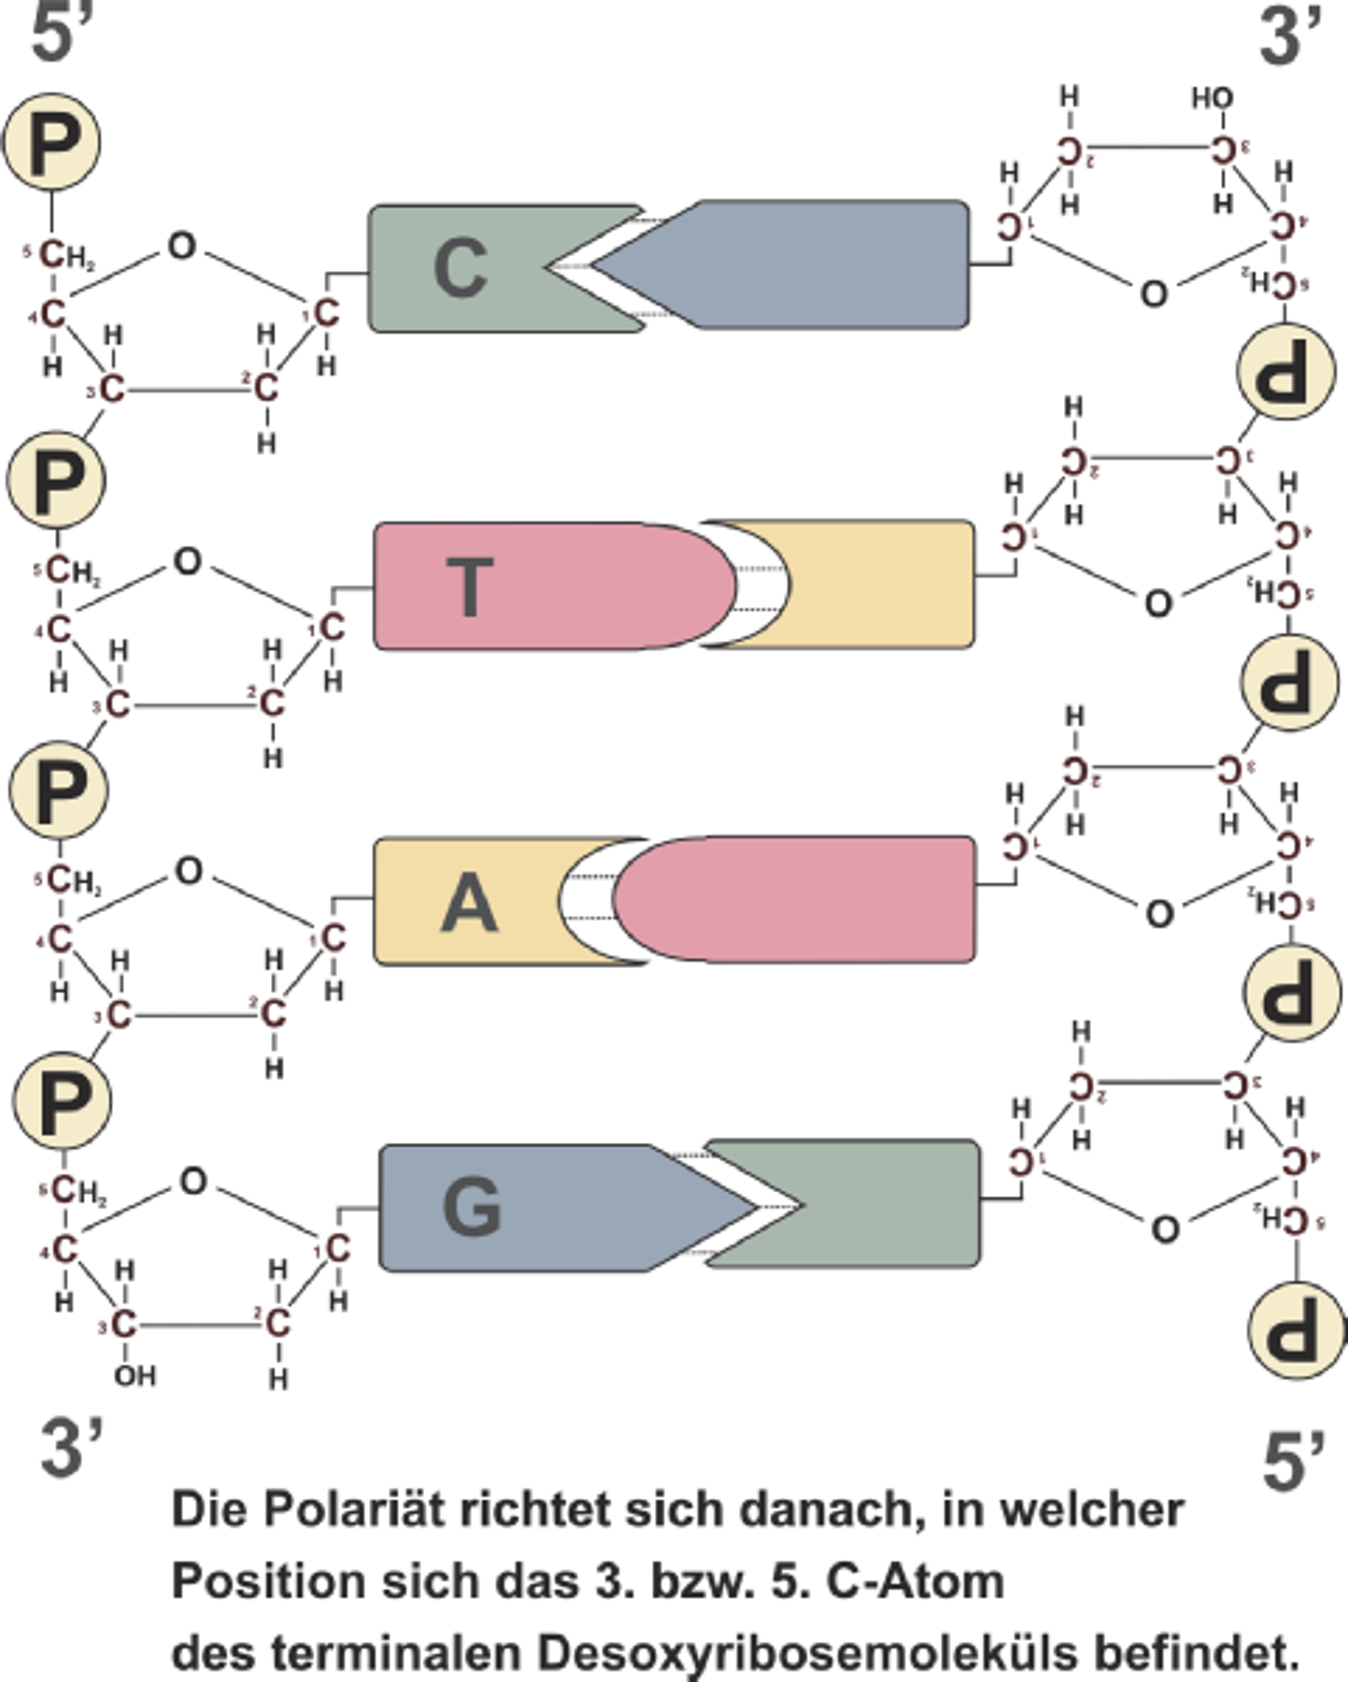 Fantastisch DNA Basenpaarung Arbeitsblatt Antworten Ideen ...